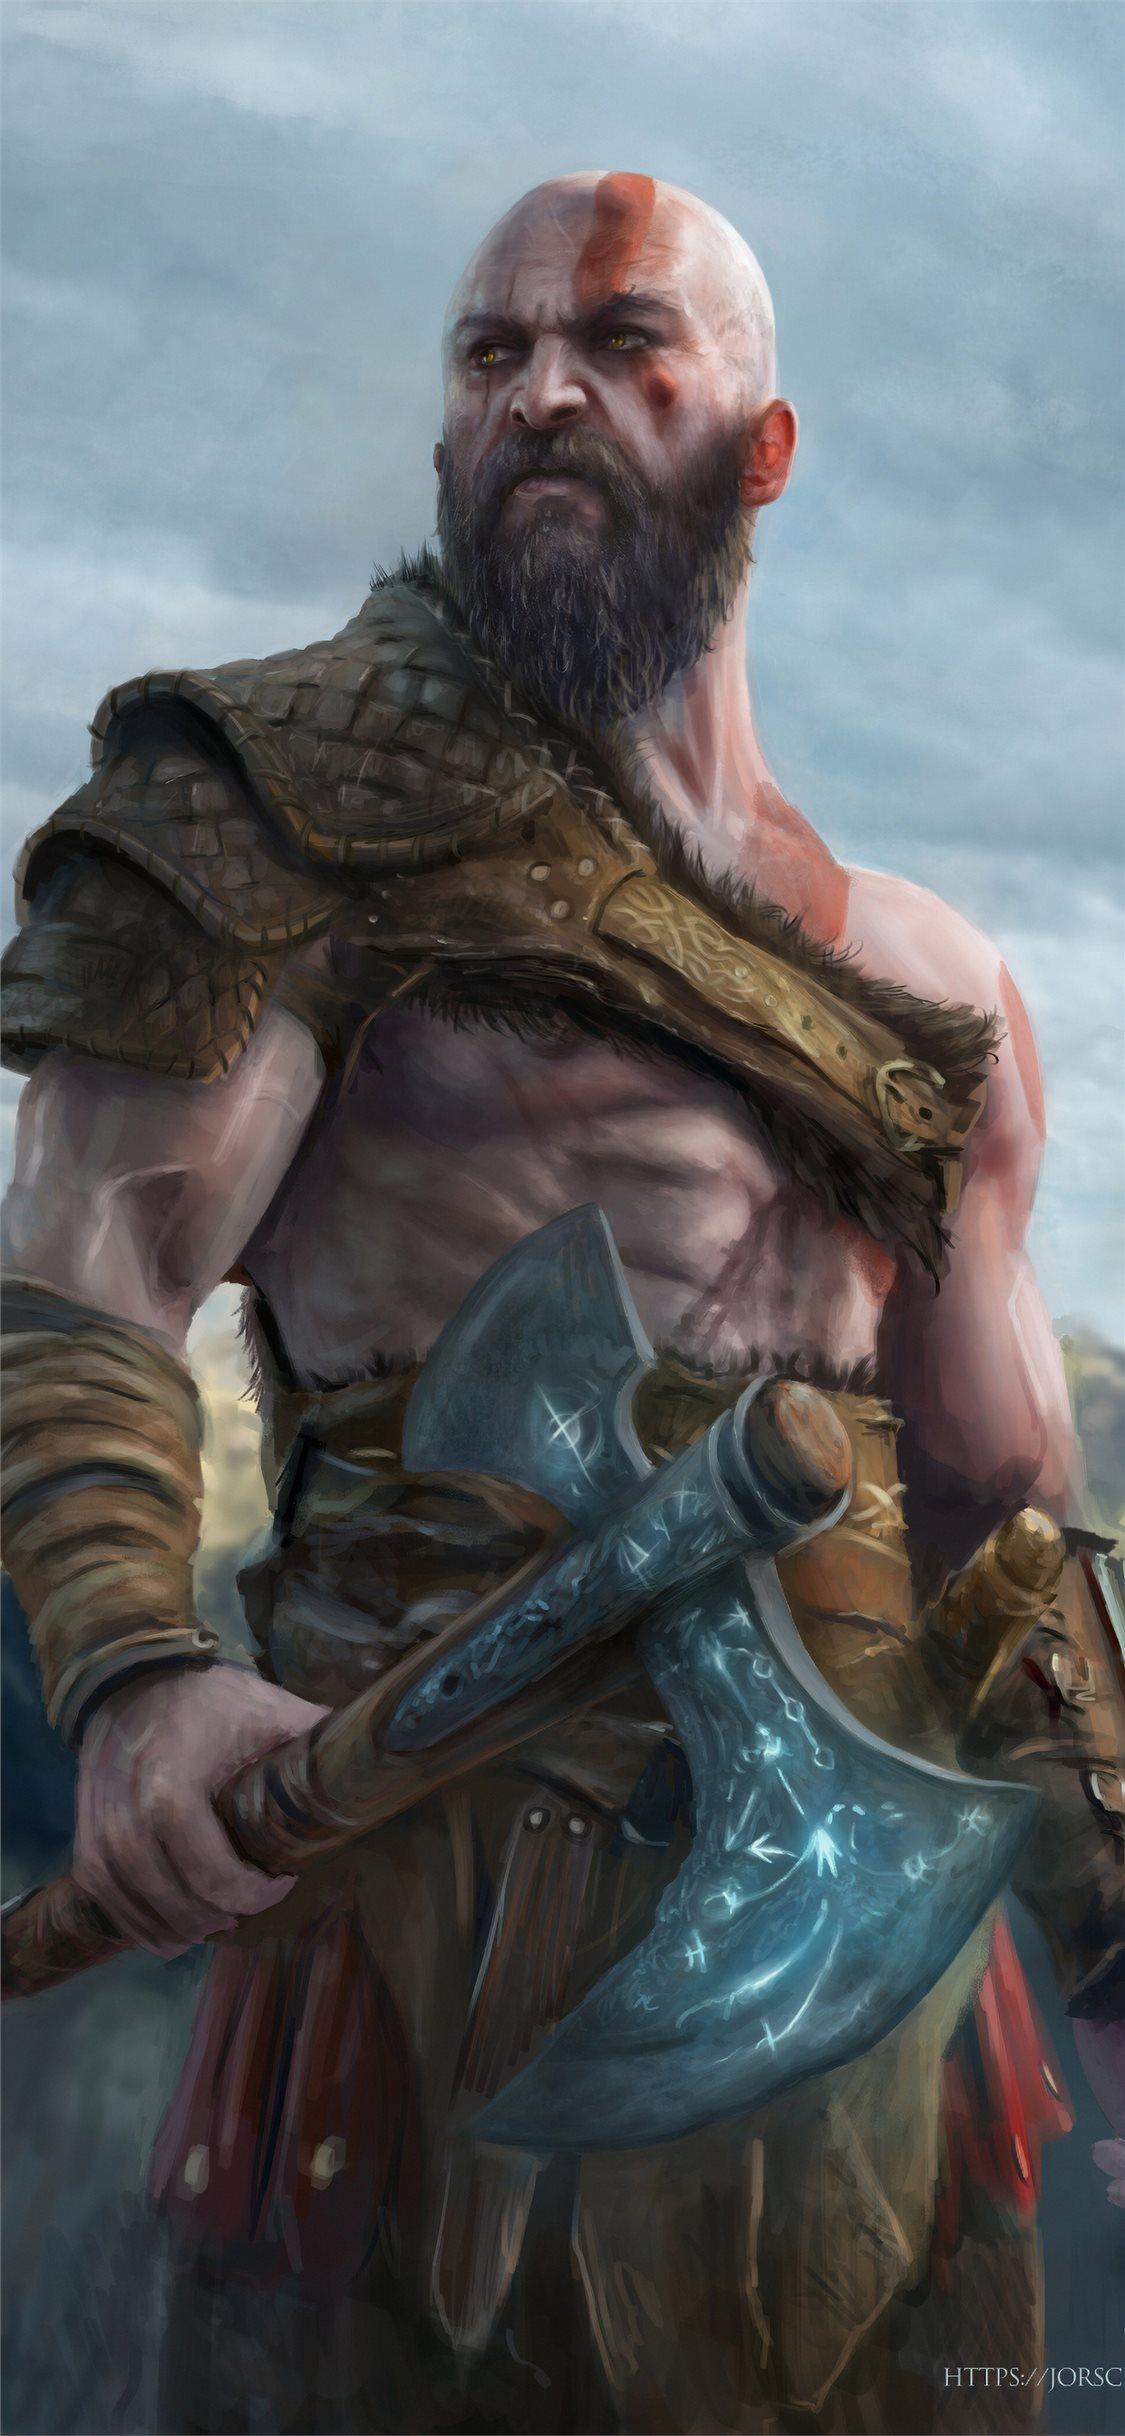 Kratos 4k New Artwork Iphone X Wallpapers Free Download